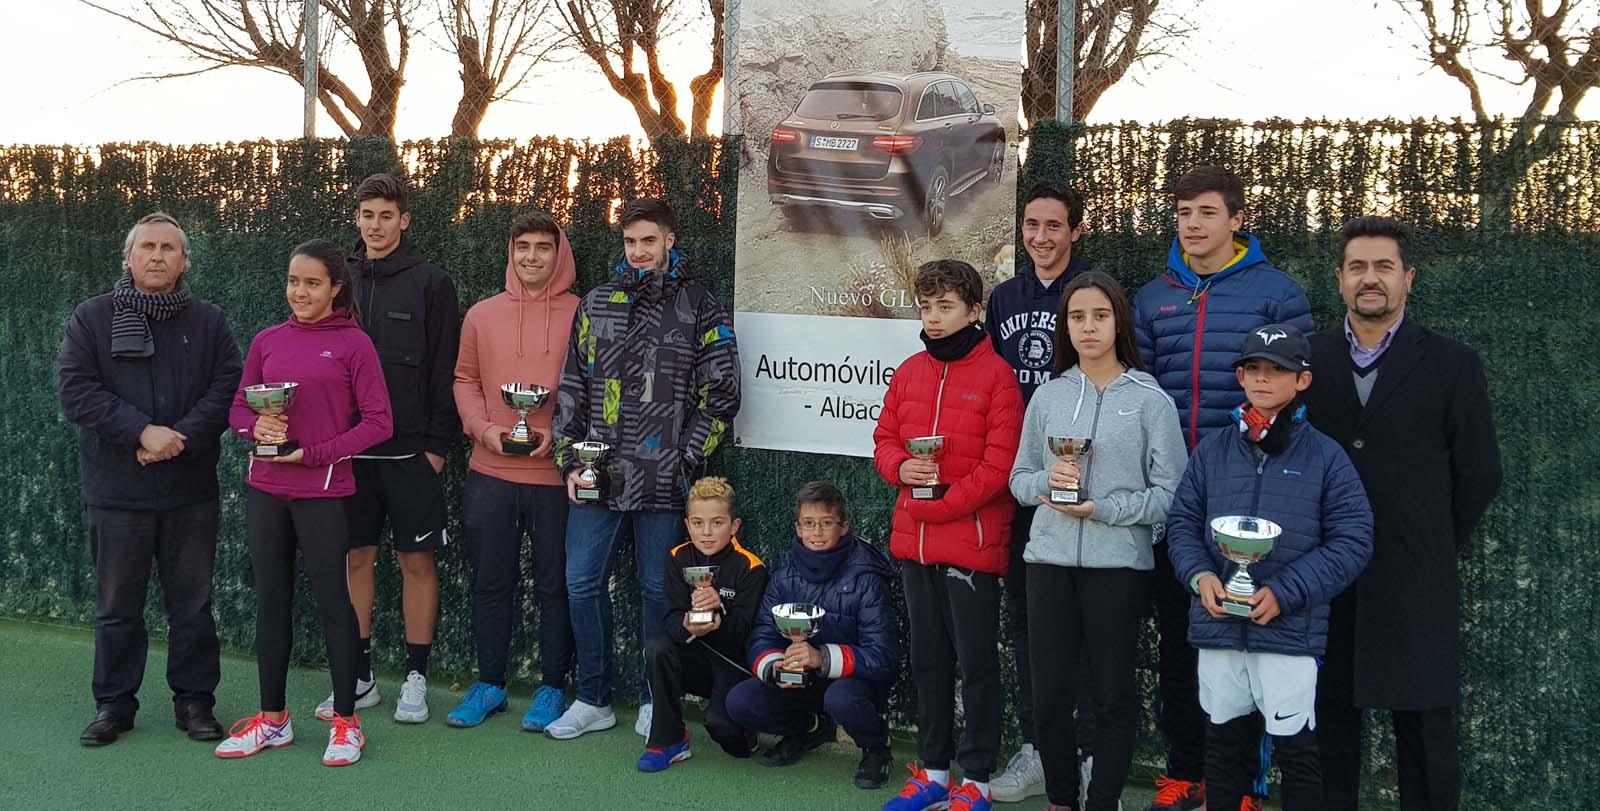 Open de Tenis Automóviles Villar Mercedes Benz 2017